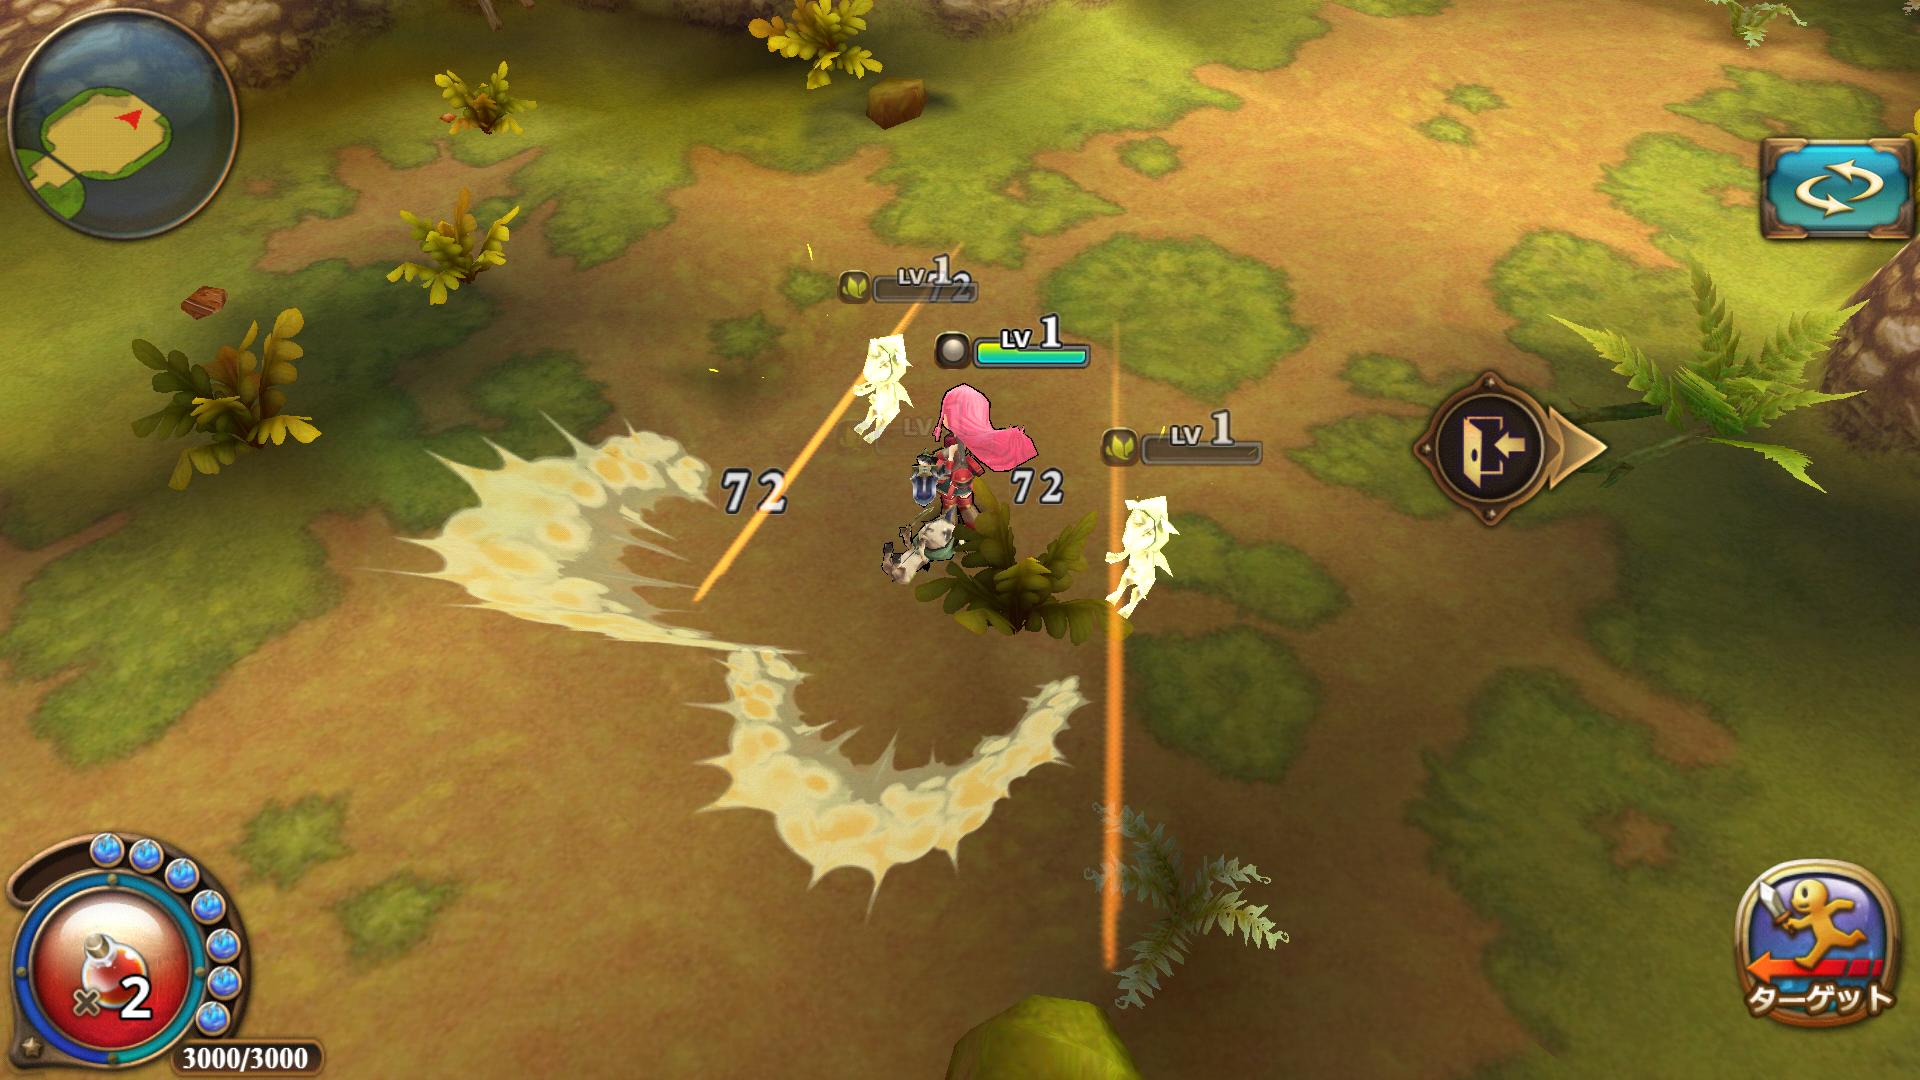 androidアプリ オービットレジェンド(Orbit Legends)攻略スクリーンショット3